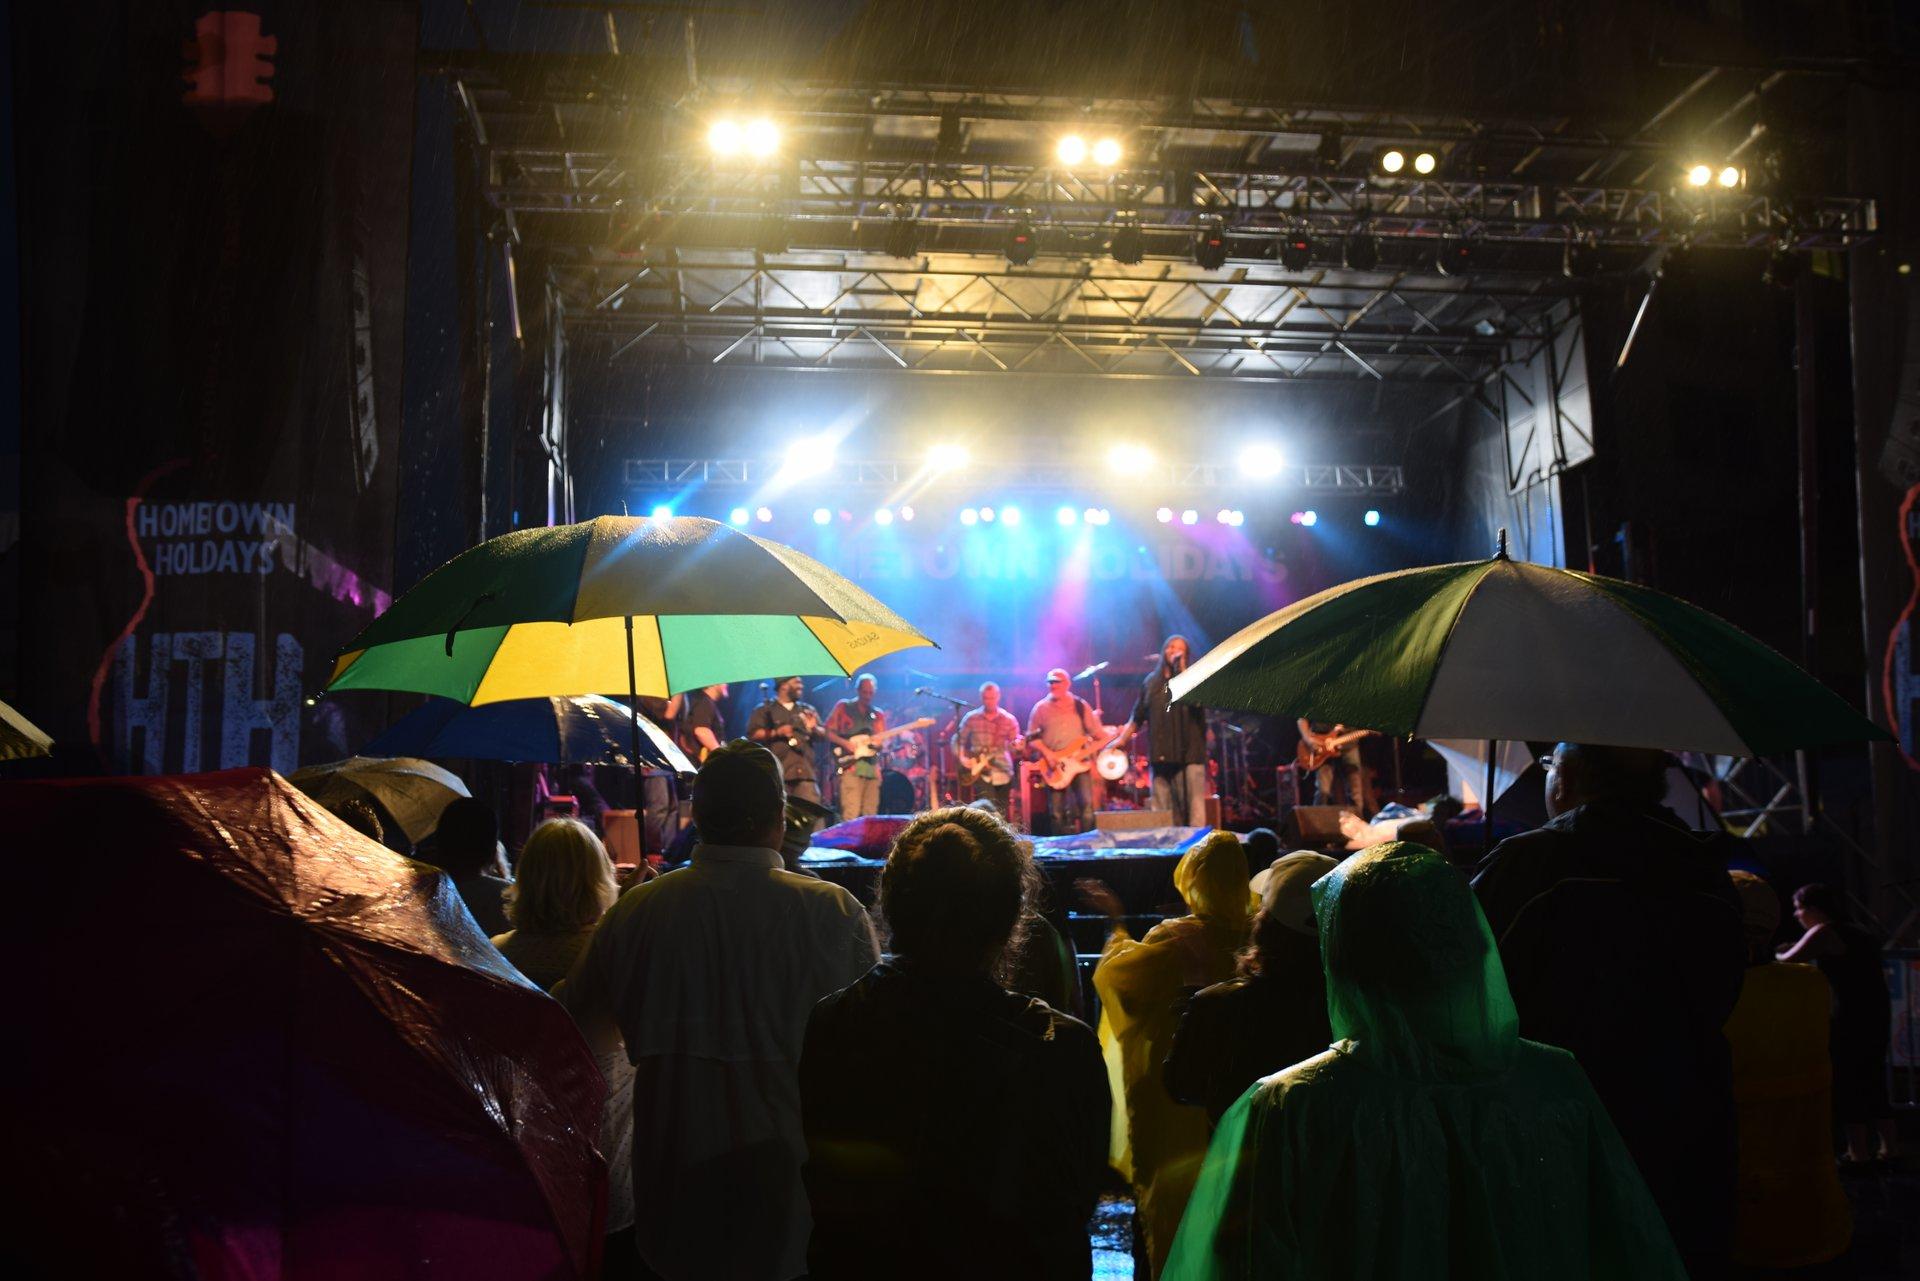 Rockville Hometown Holidays Music Festival 2020